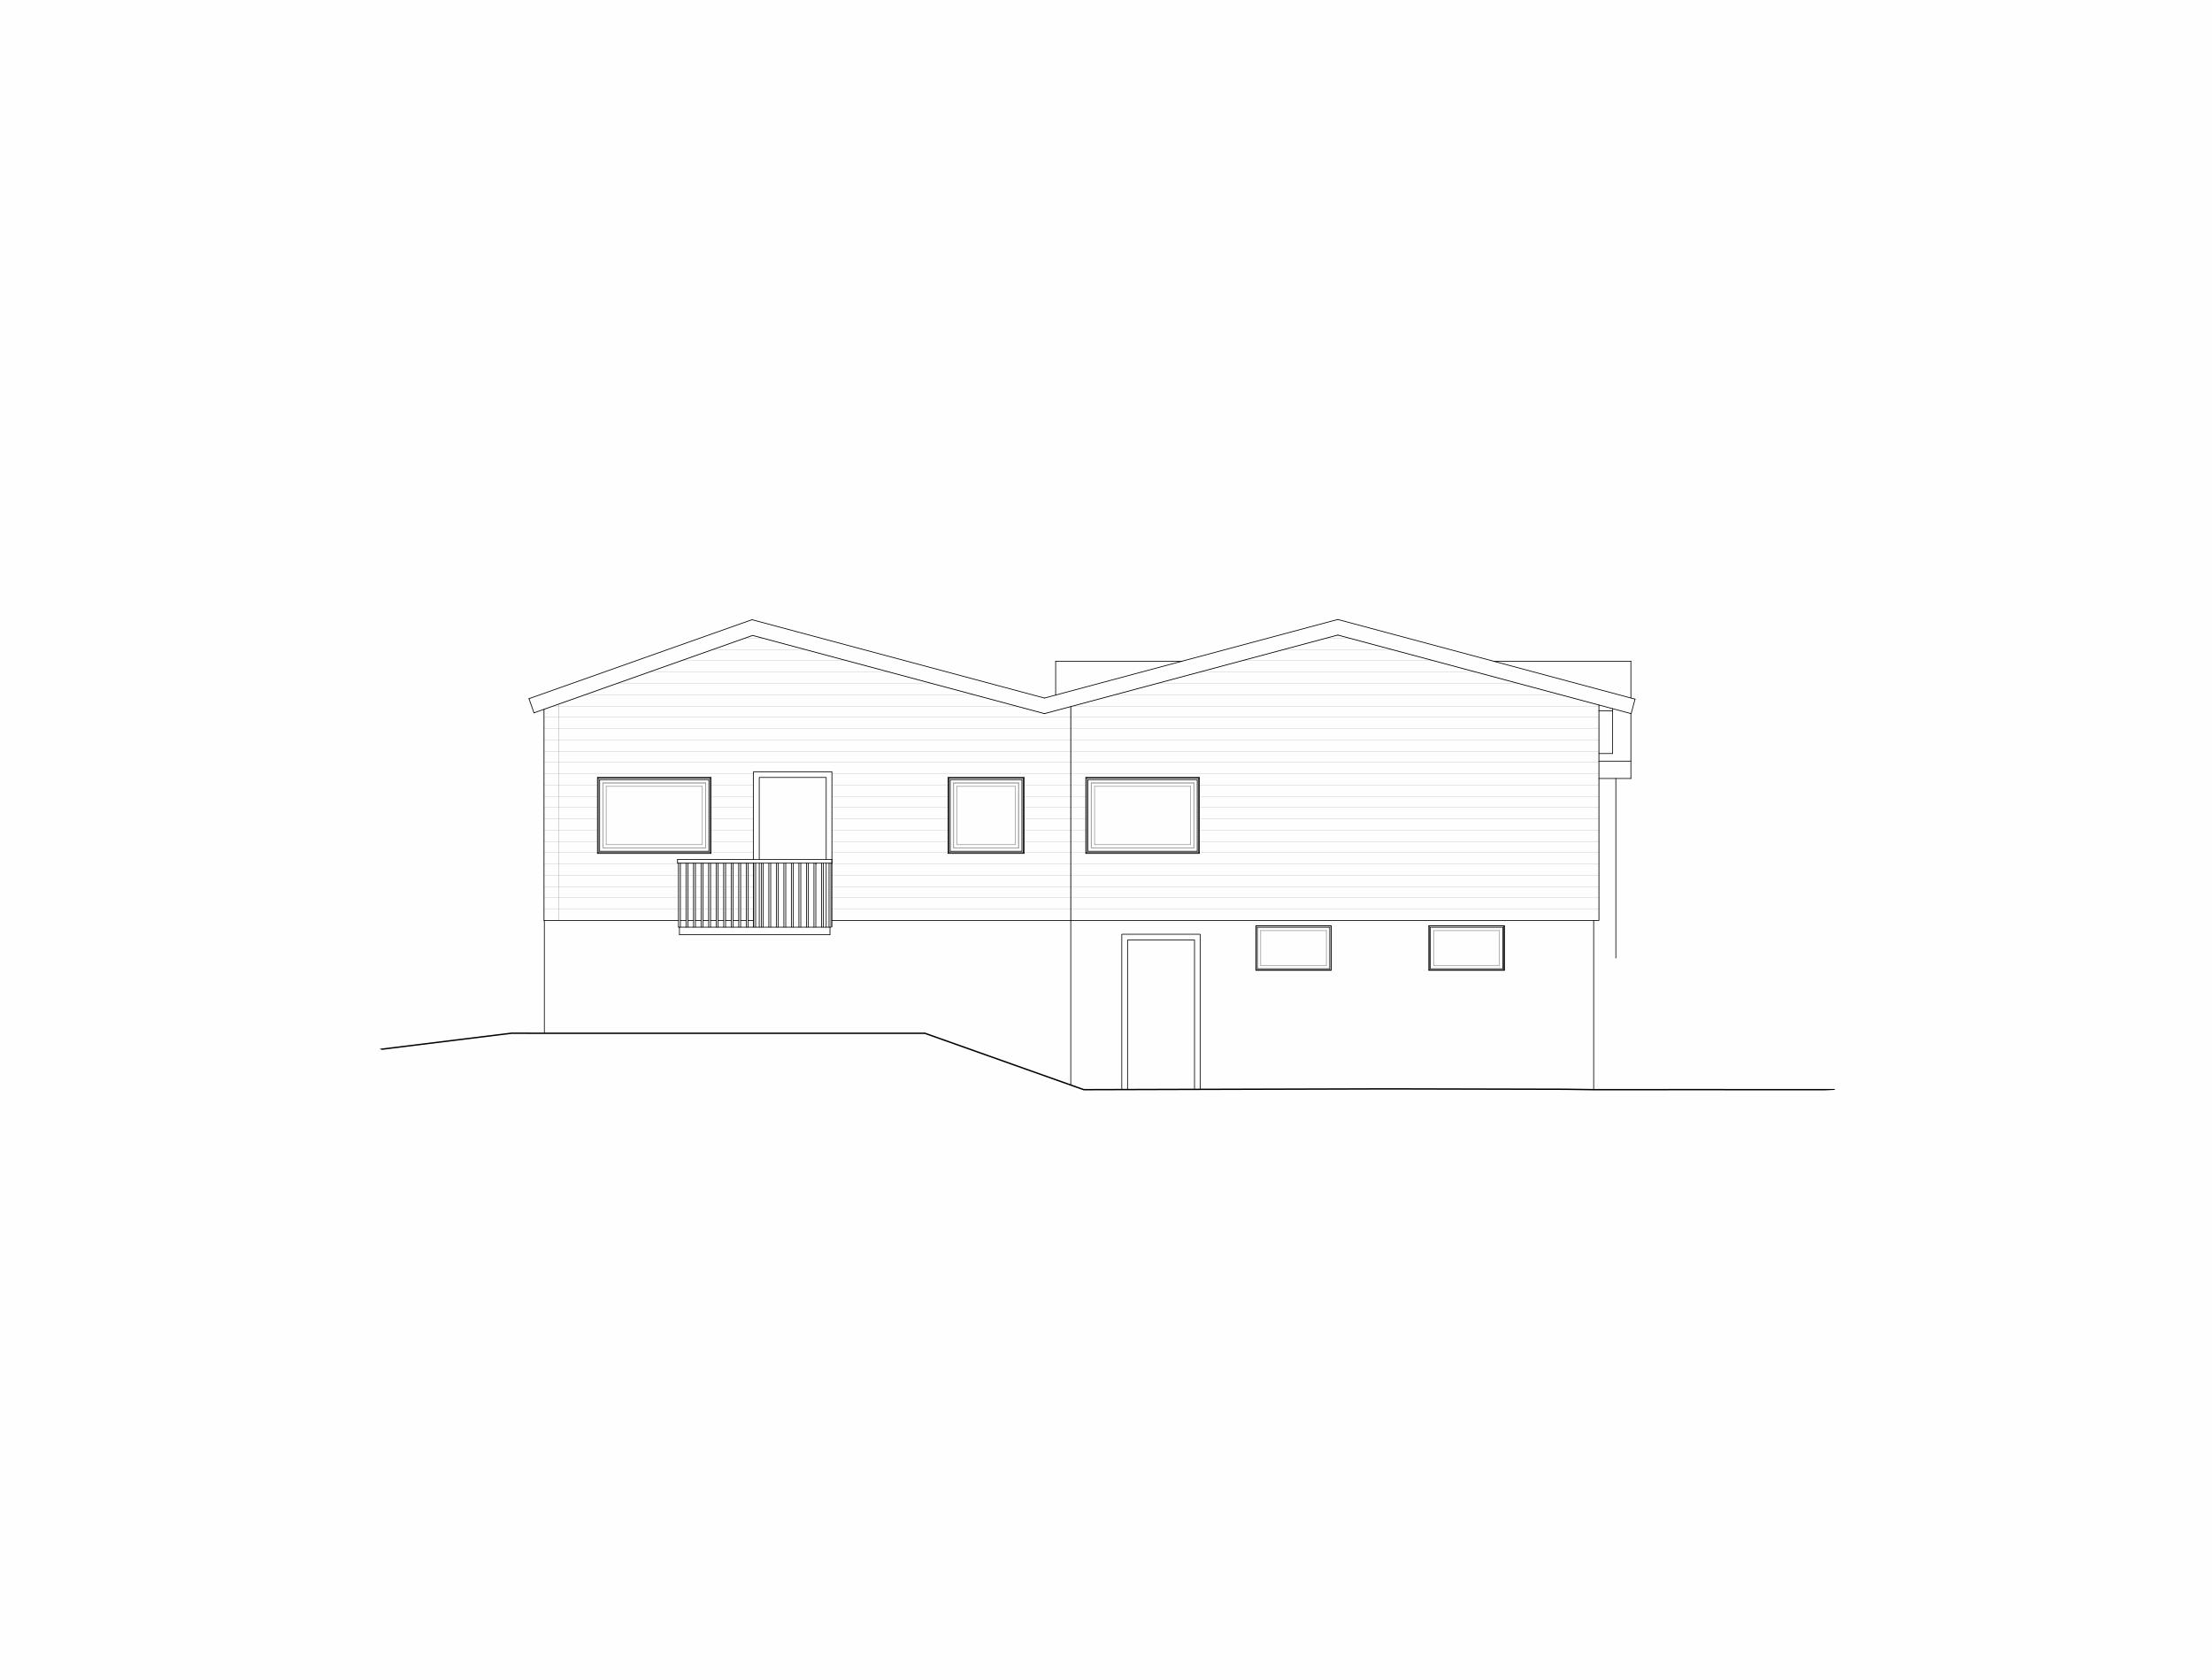 Forunderlig Arkitektur - 1601 - Fasade Øst